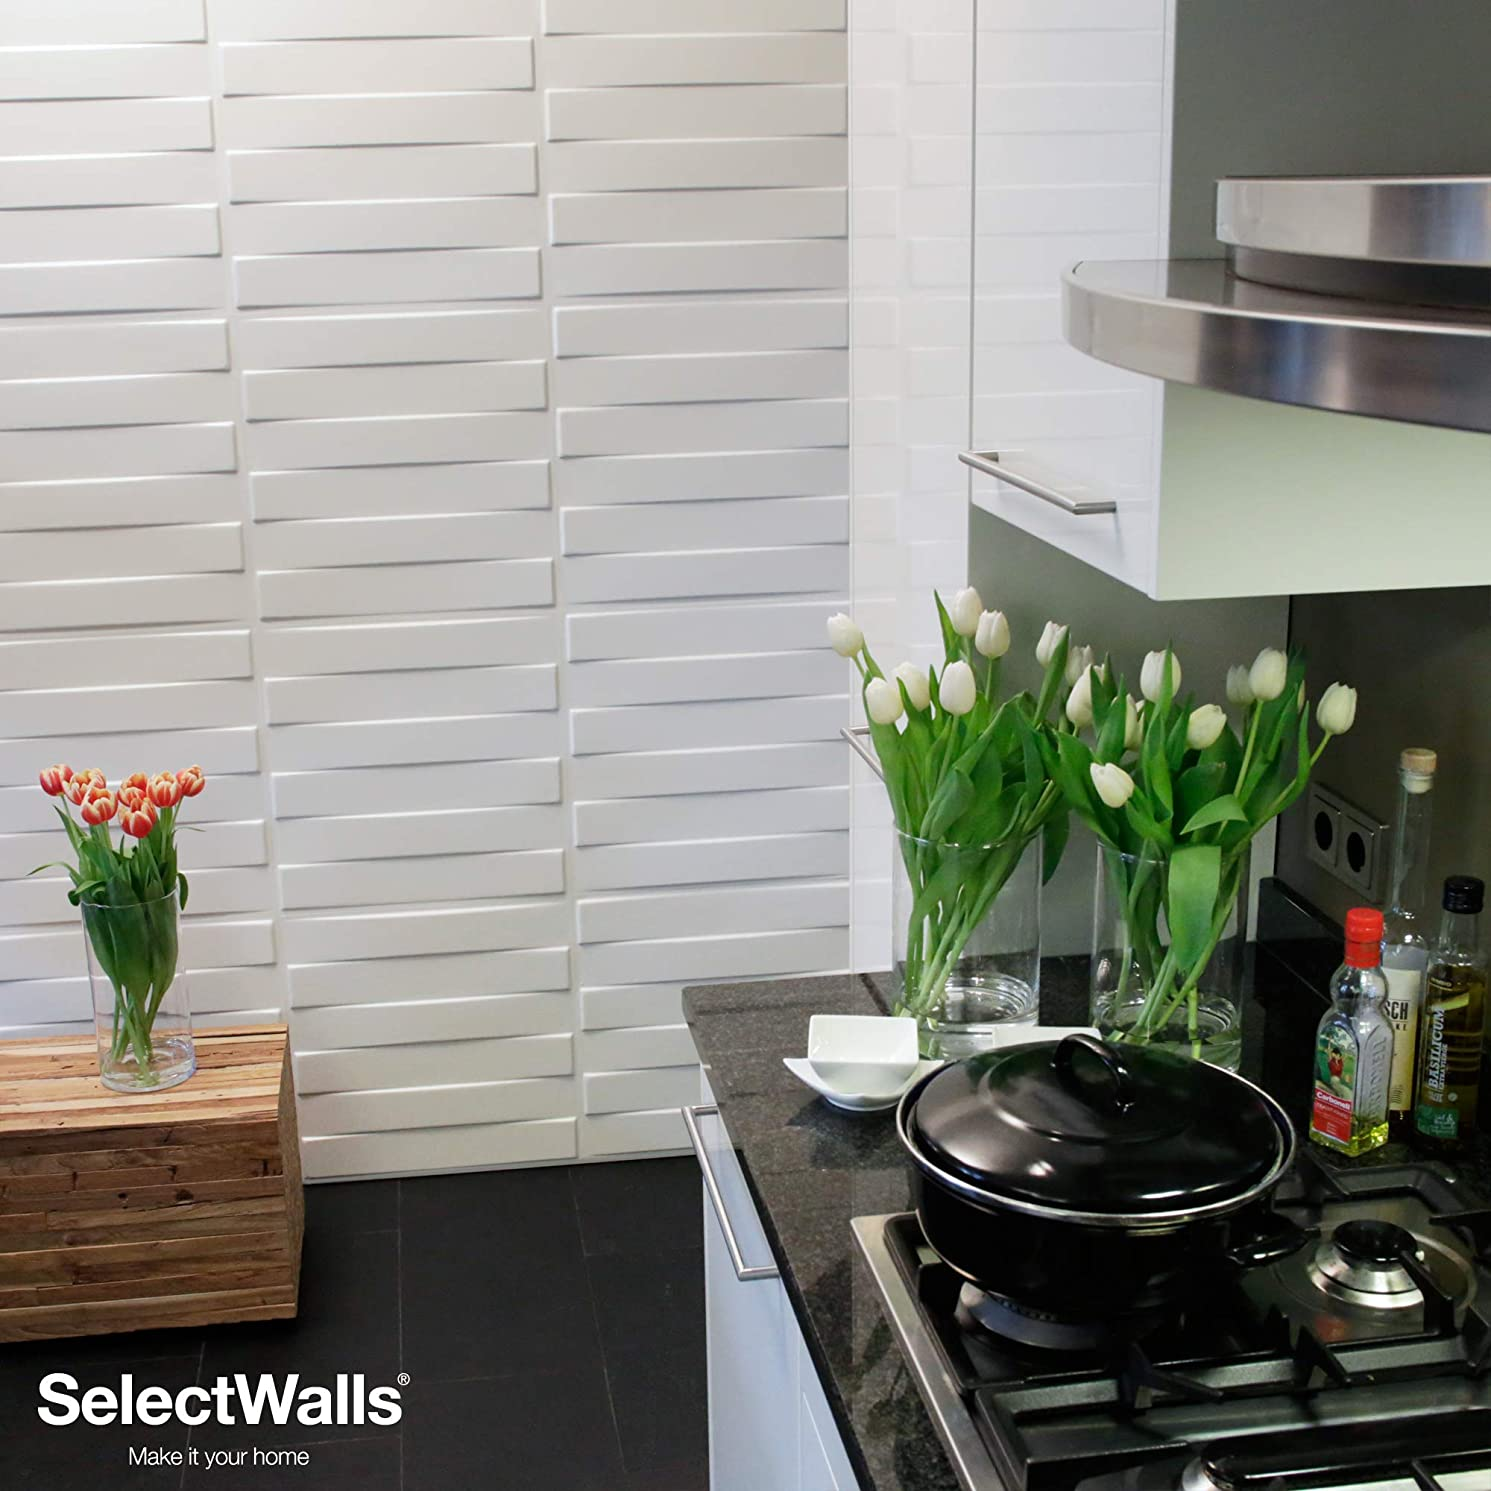 3D Wall Wood Panels from MDF Wood (10/Box) 27 sqft- FINN Wall Paneling Design.